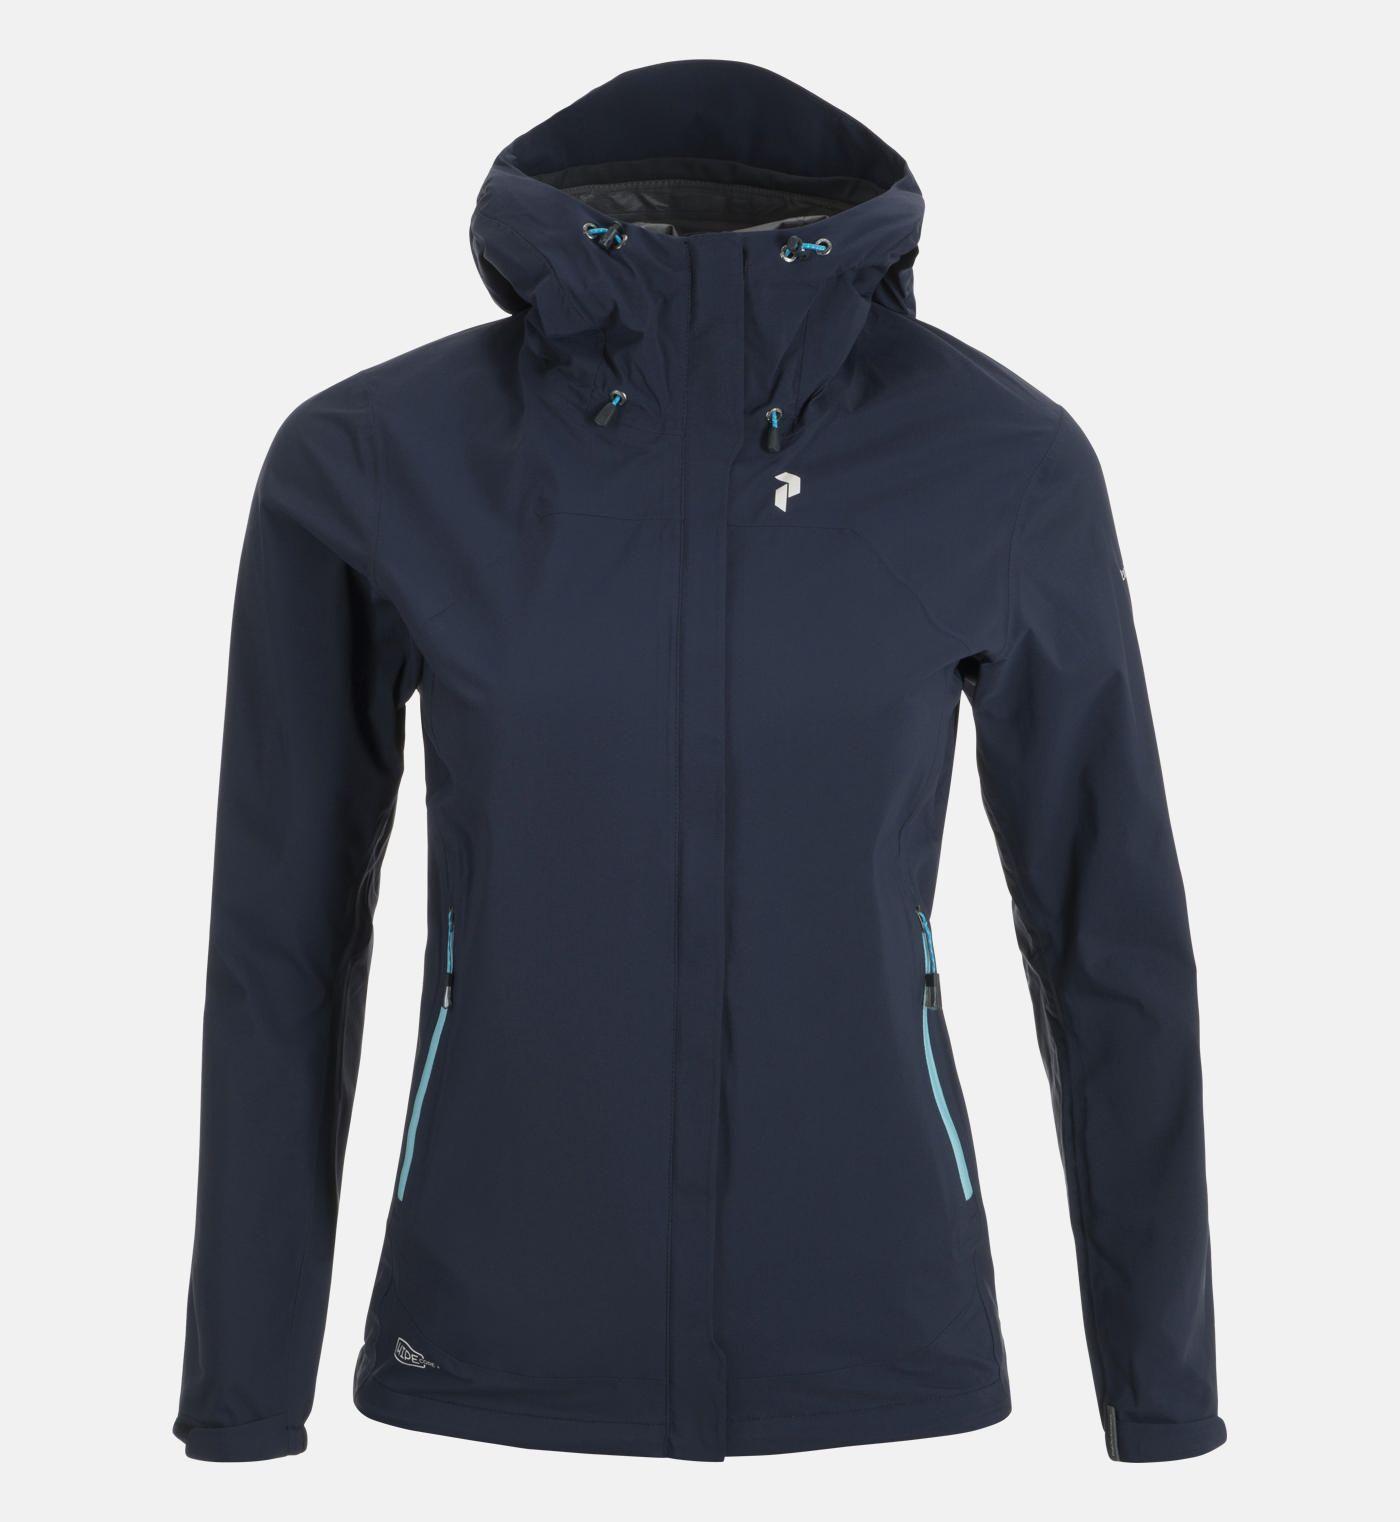 Women's Swift Jacket outdoor Peak Performance | Jacka